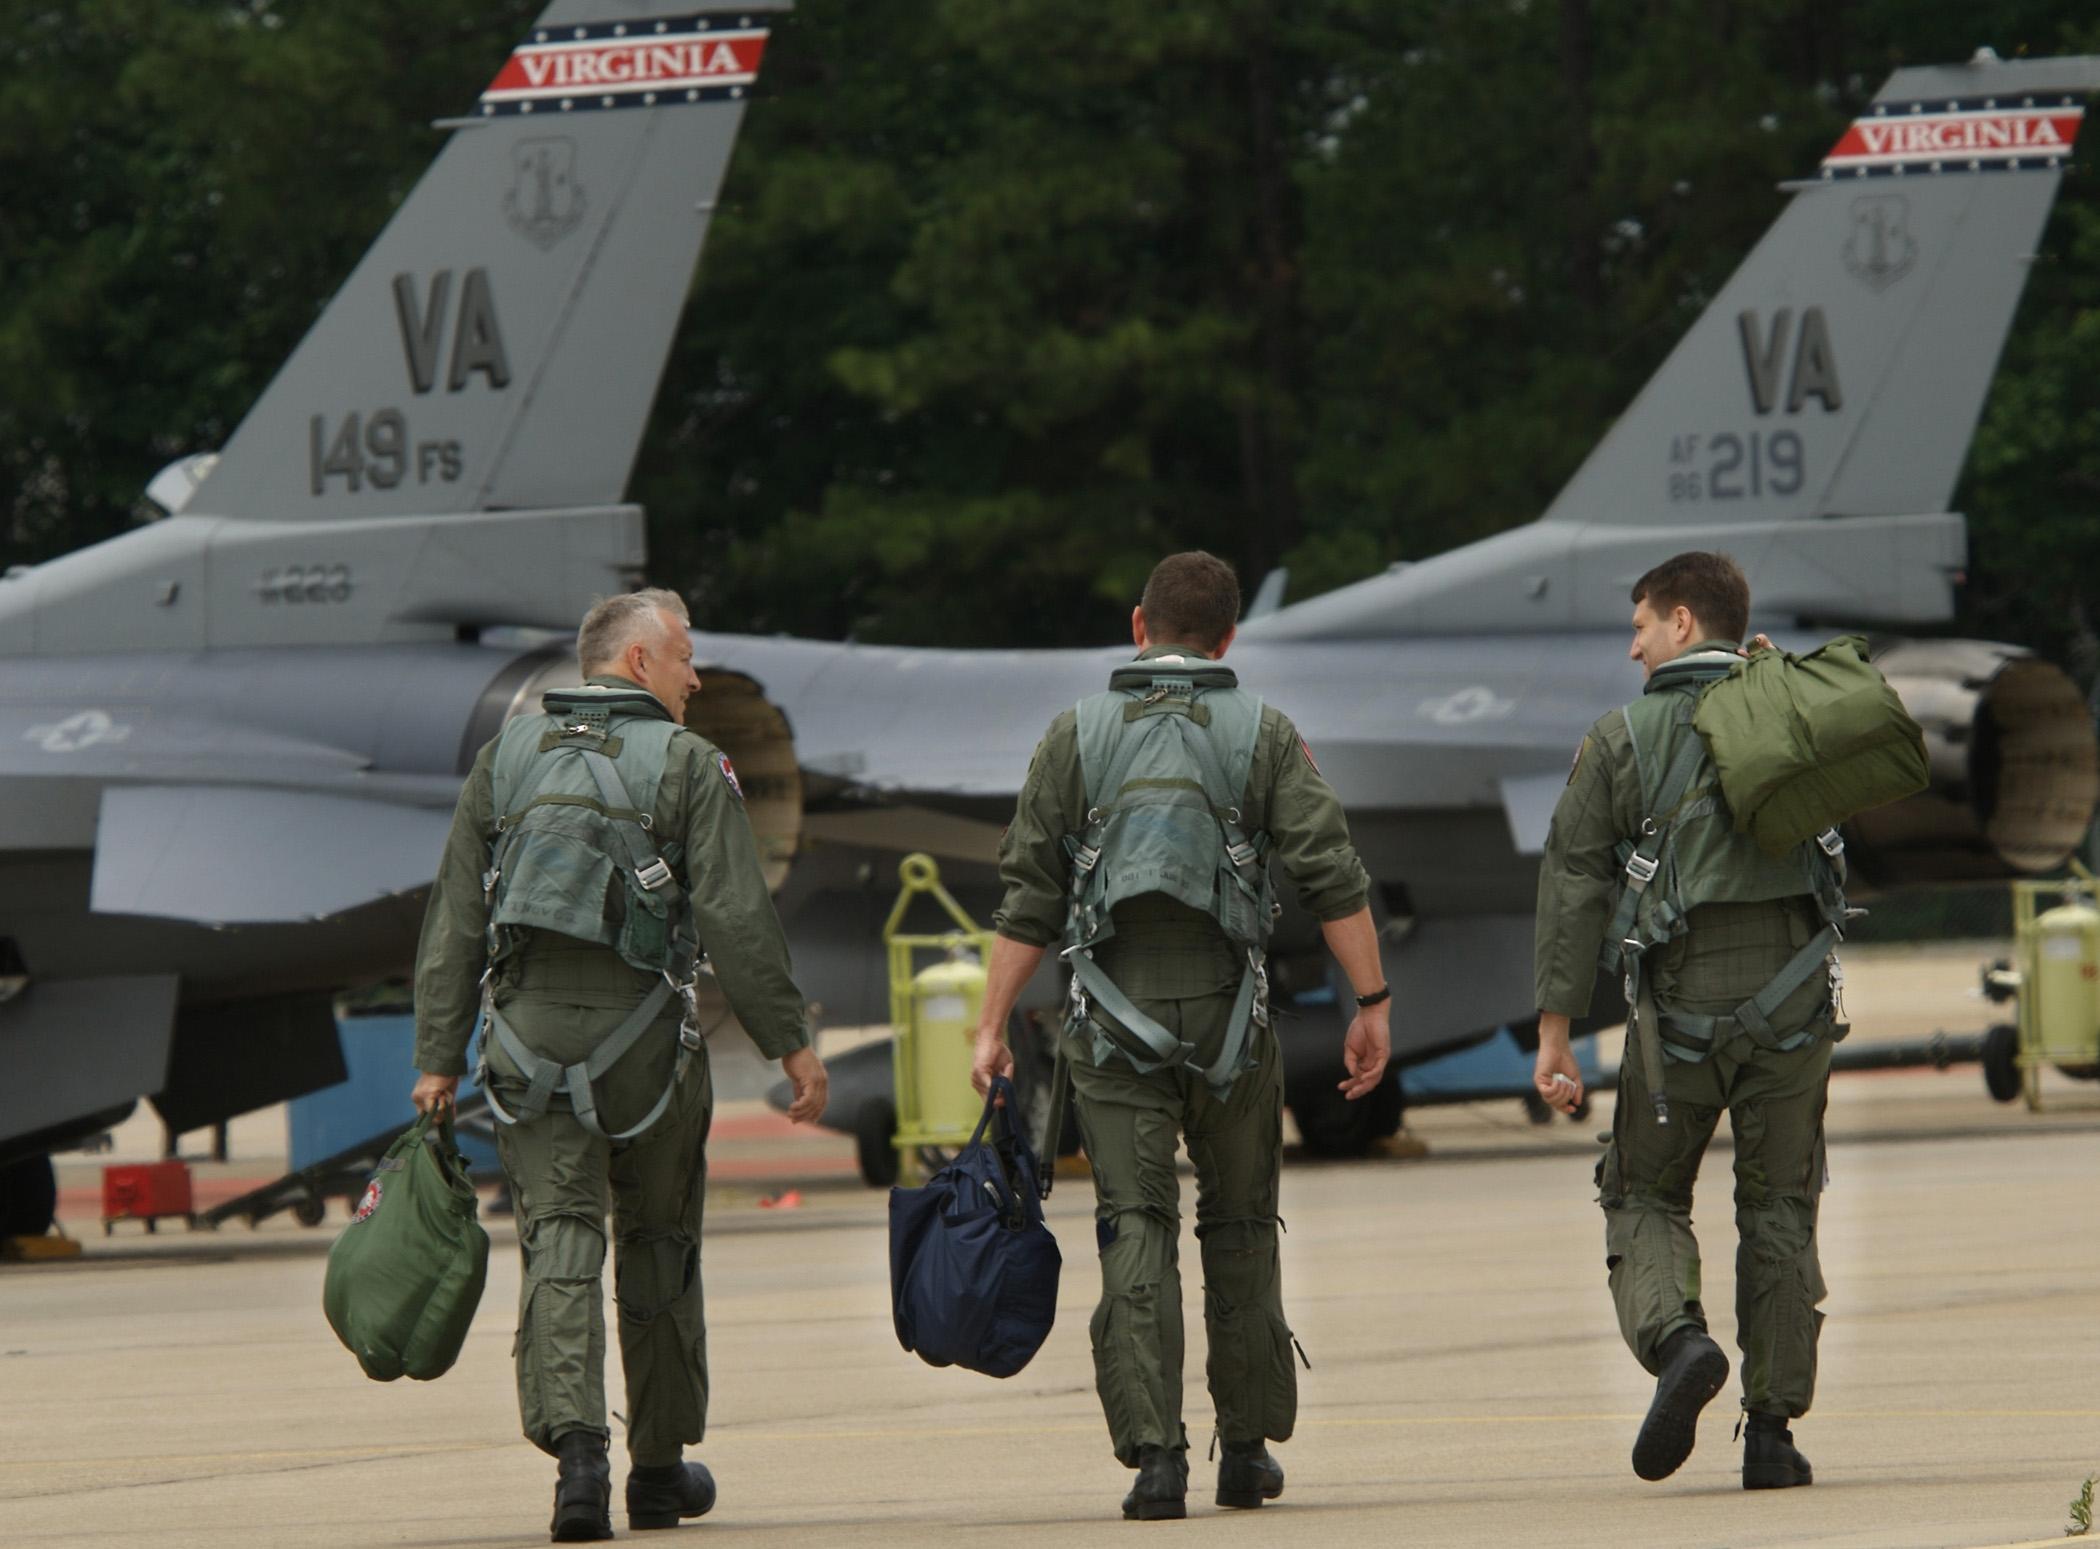 The Falcons Final Flight